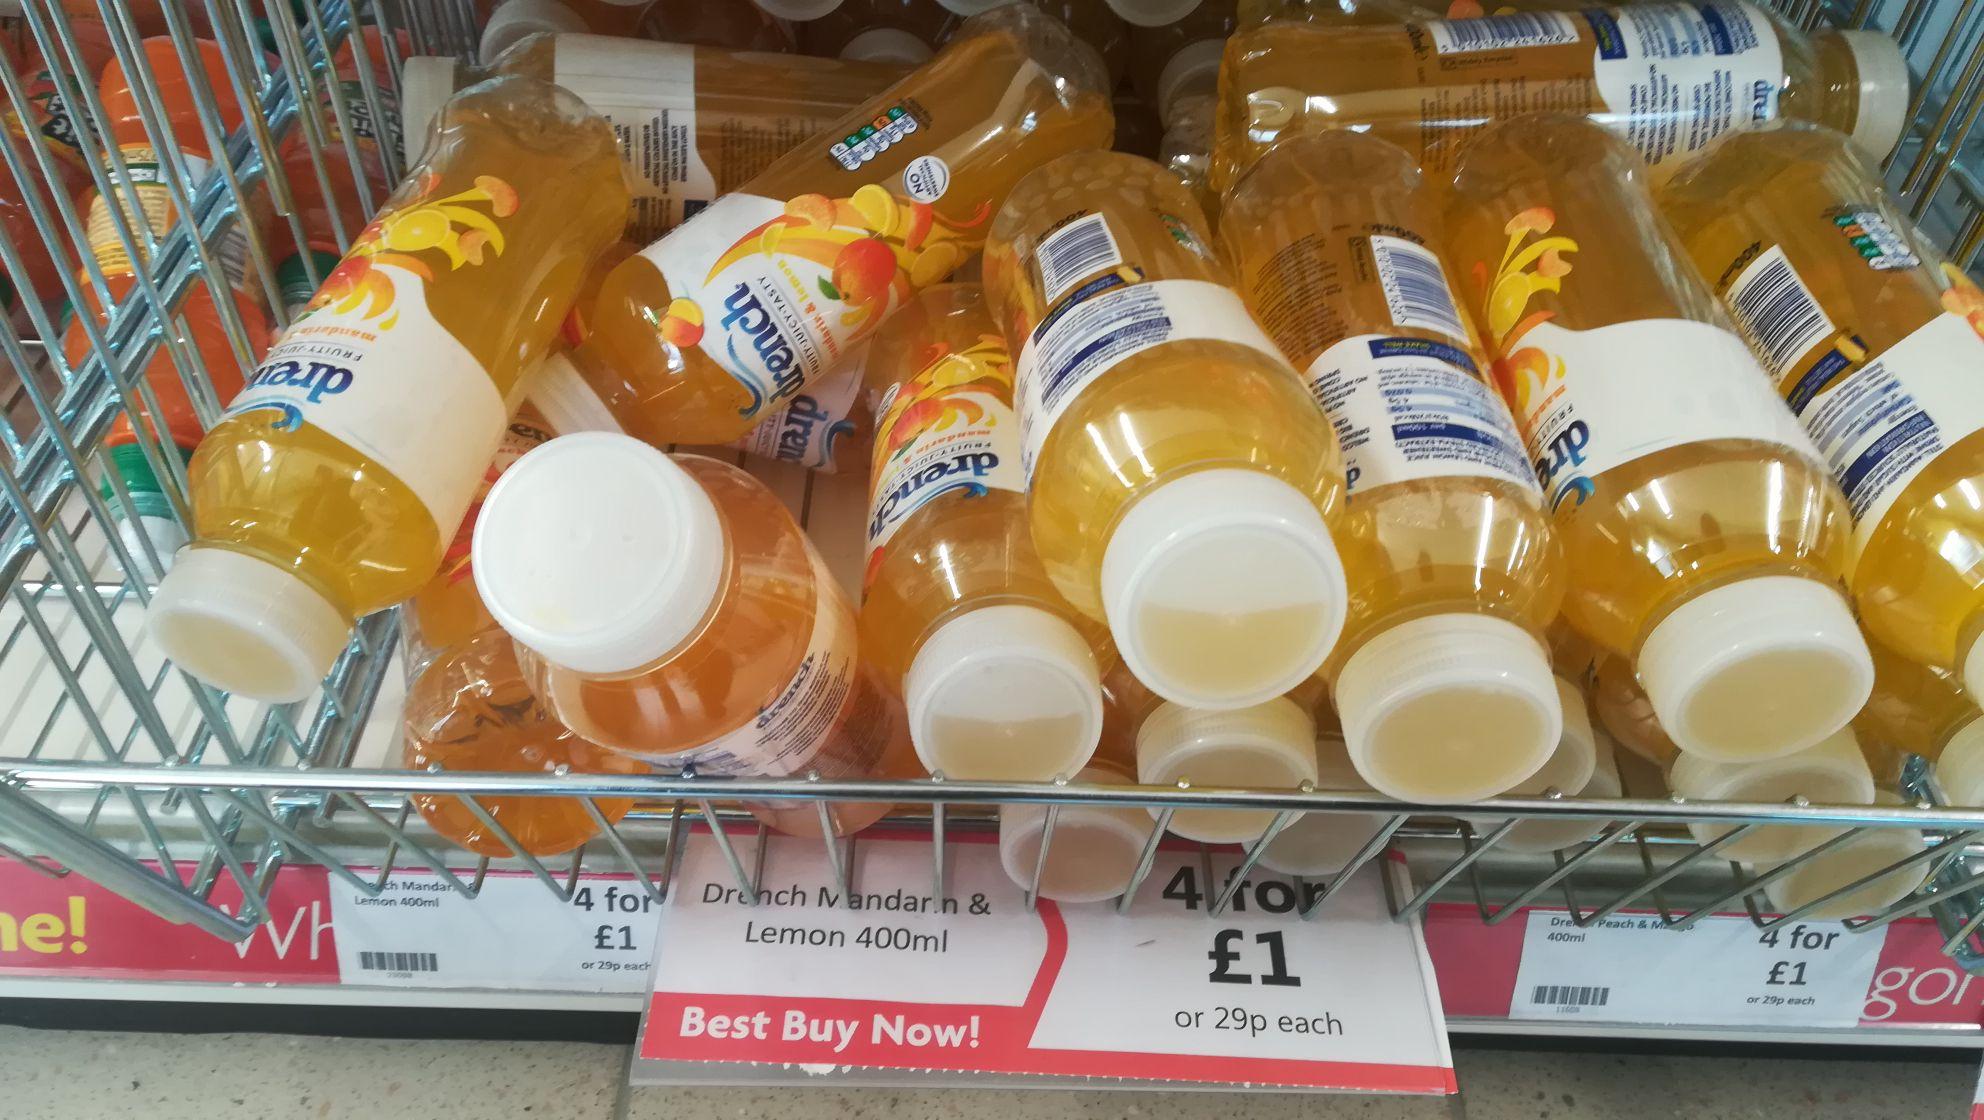 Drench Mandarin & Lemon 400ml - 4 bottles for £1 - Heron Foods Newport, South Wales